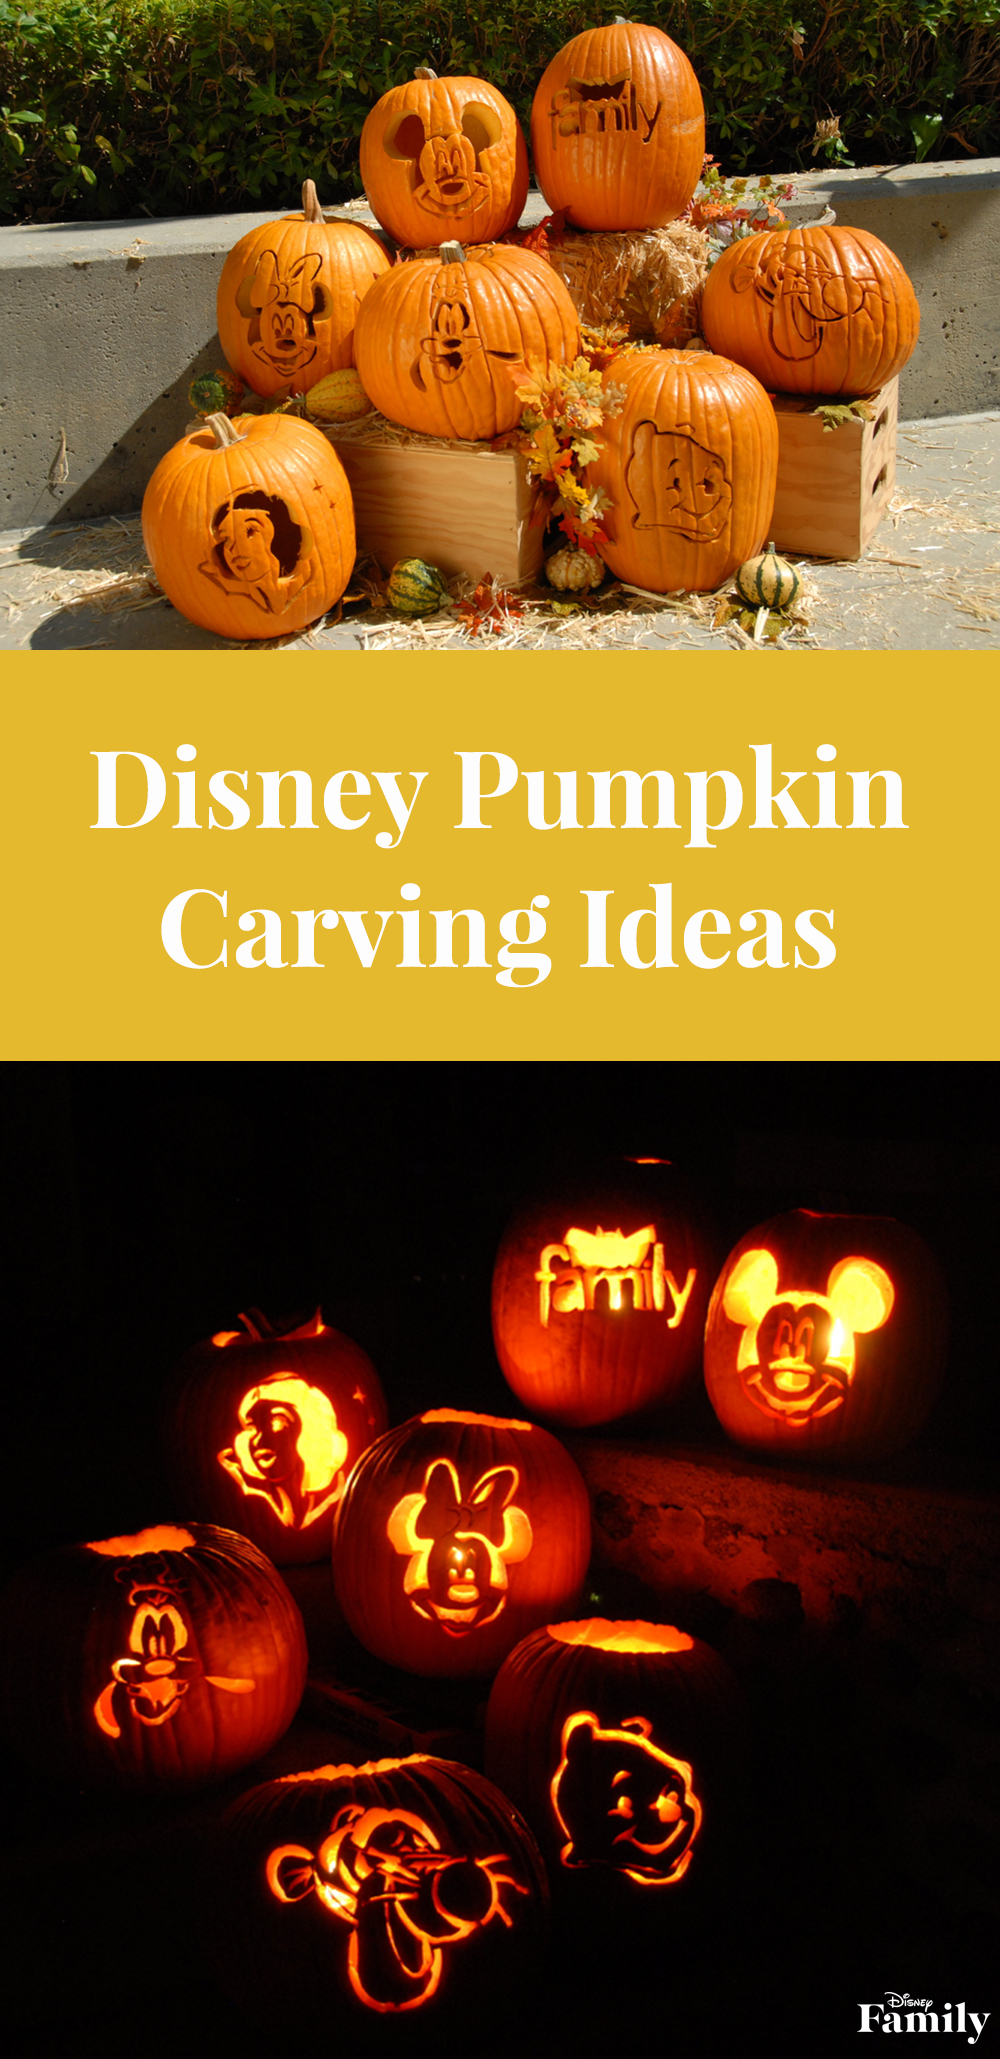 Disney Pumpkin Carving Ideas | Disney Family - Free Online Pumpkin Carving Patterns Printable